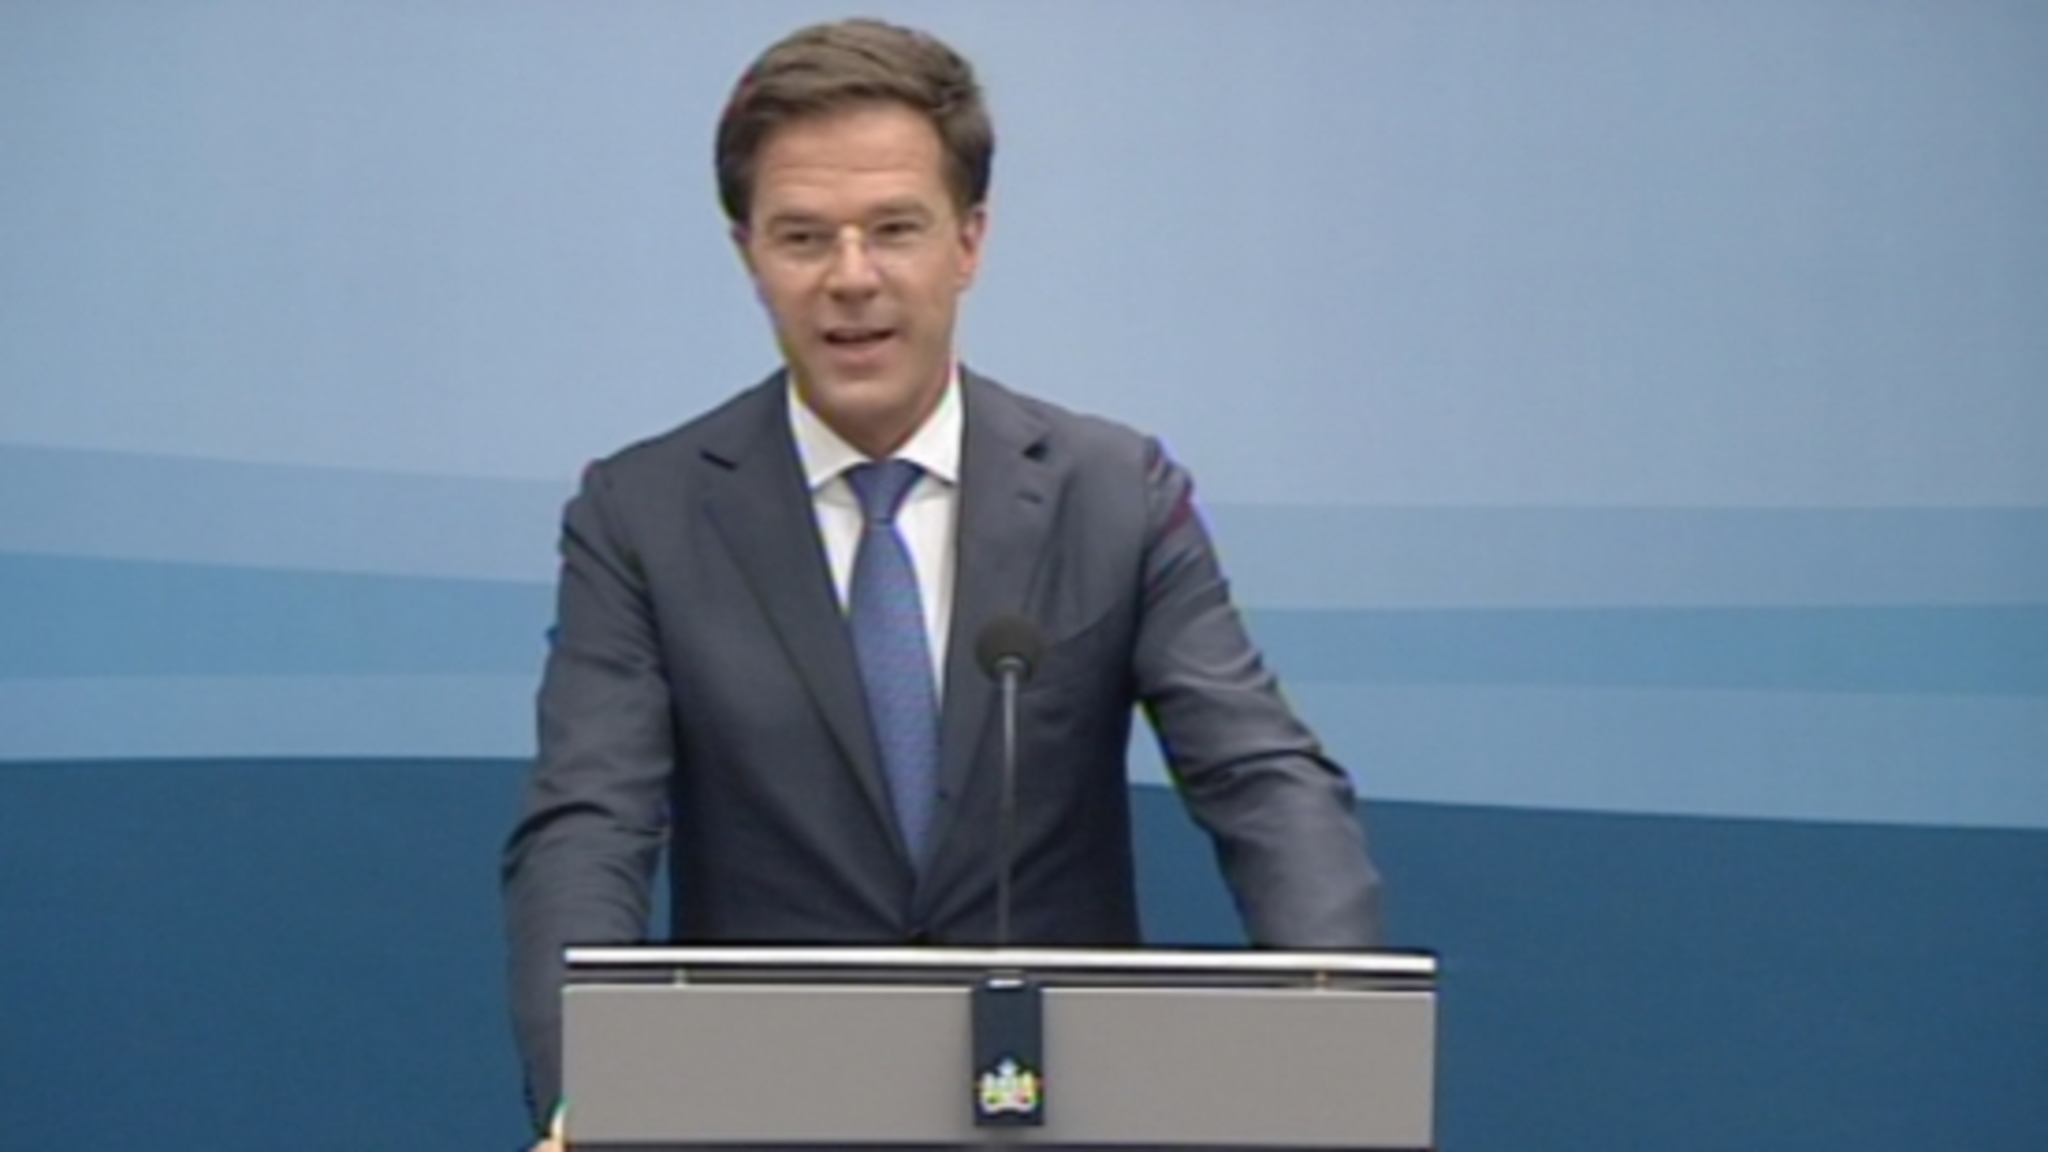 Persconferentie Premier Rutte Na Ministerraad